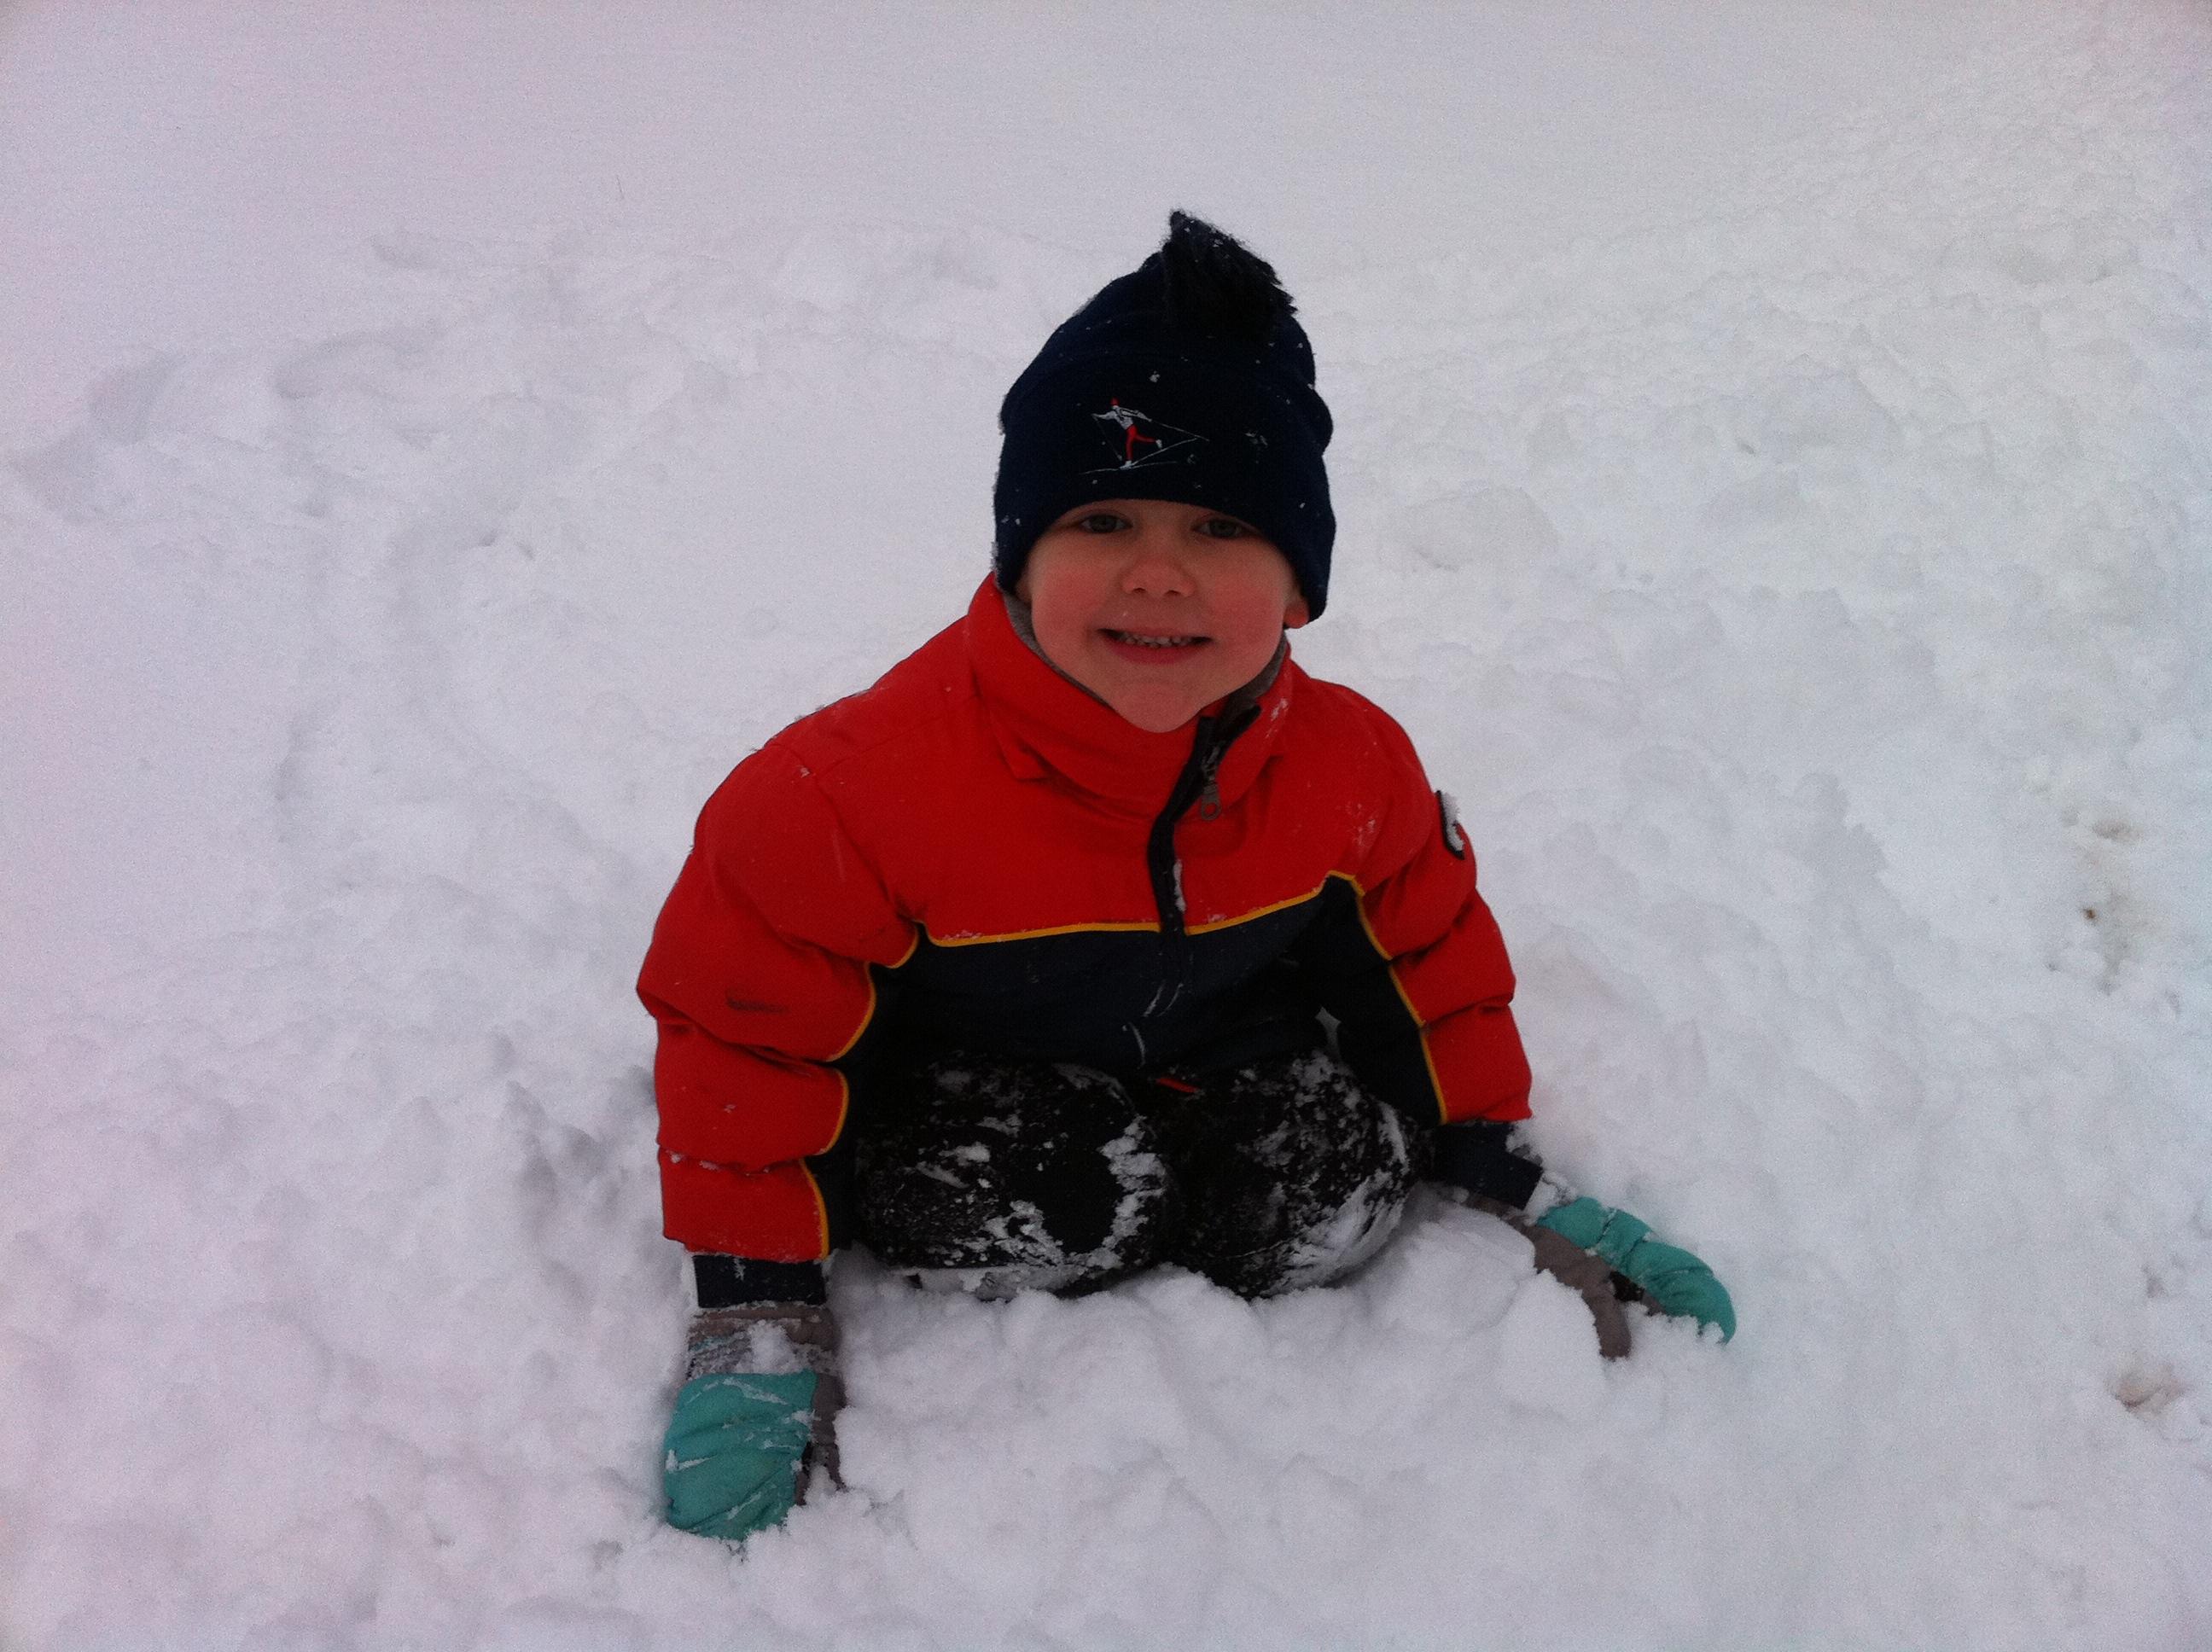 Josiah burrowing into the snow